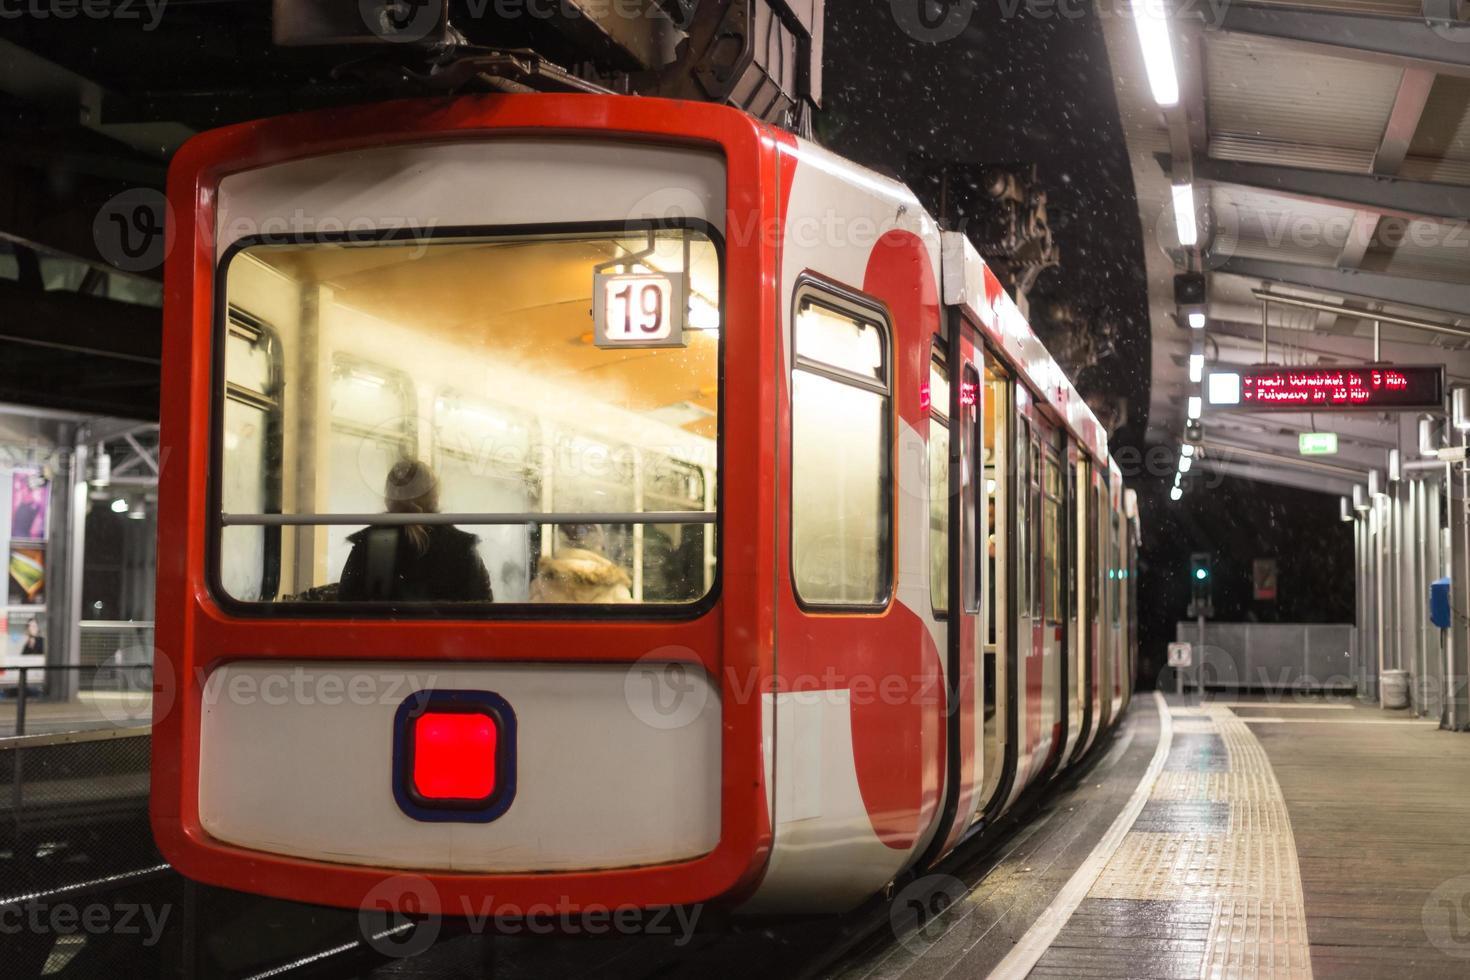 Schwebebahn treno Wuppertal Germania in una sera d'inverno foto